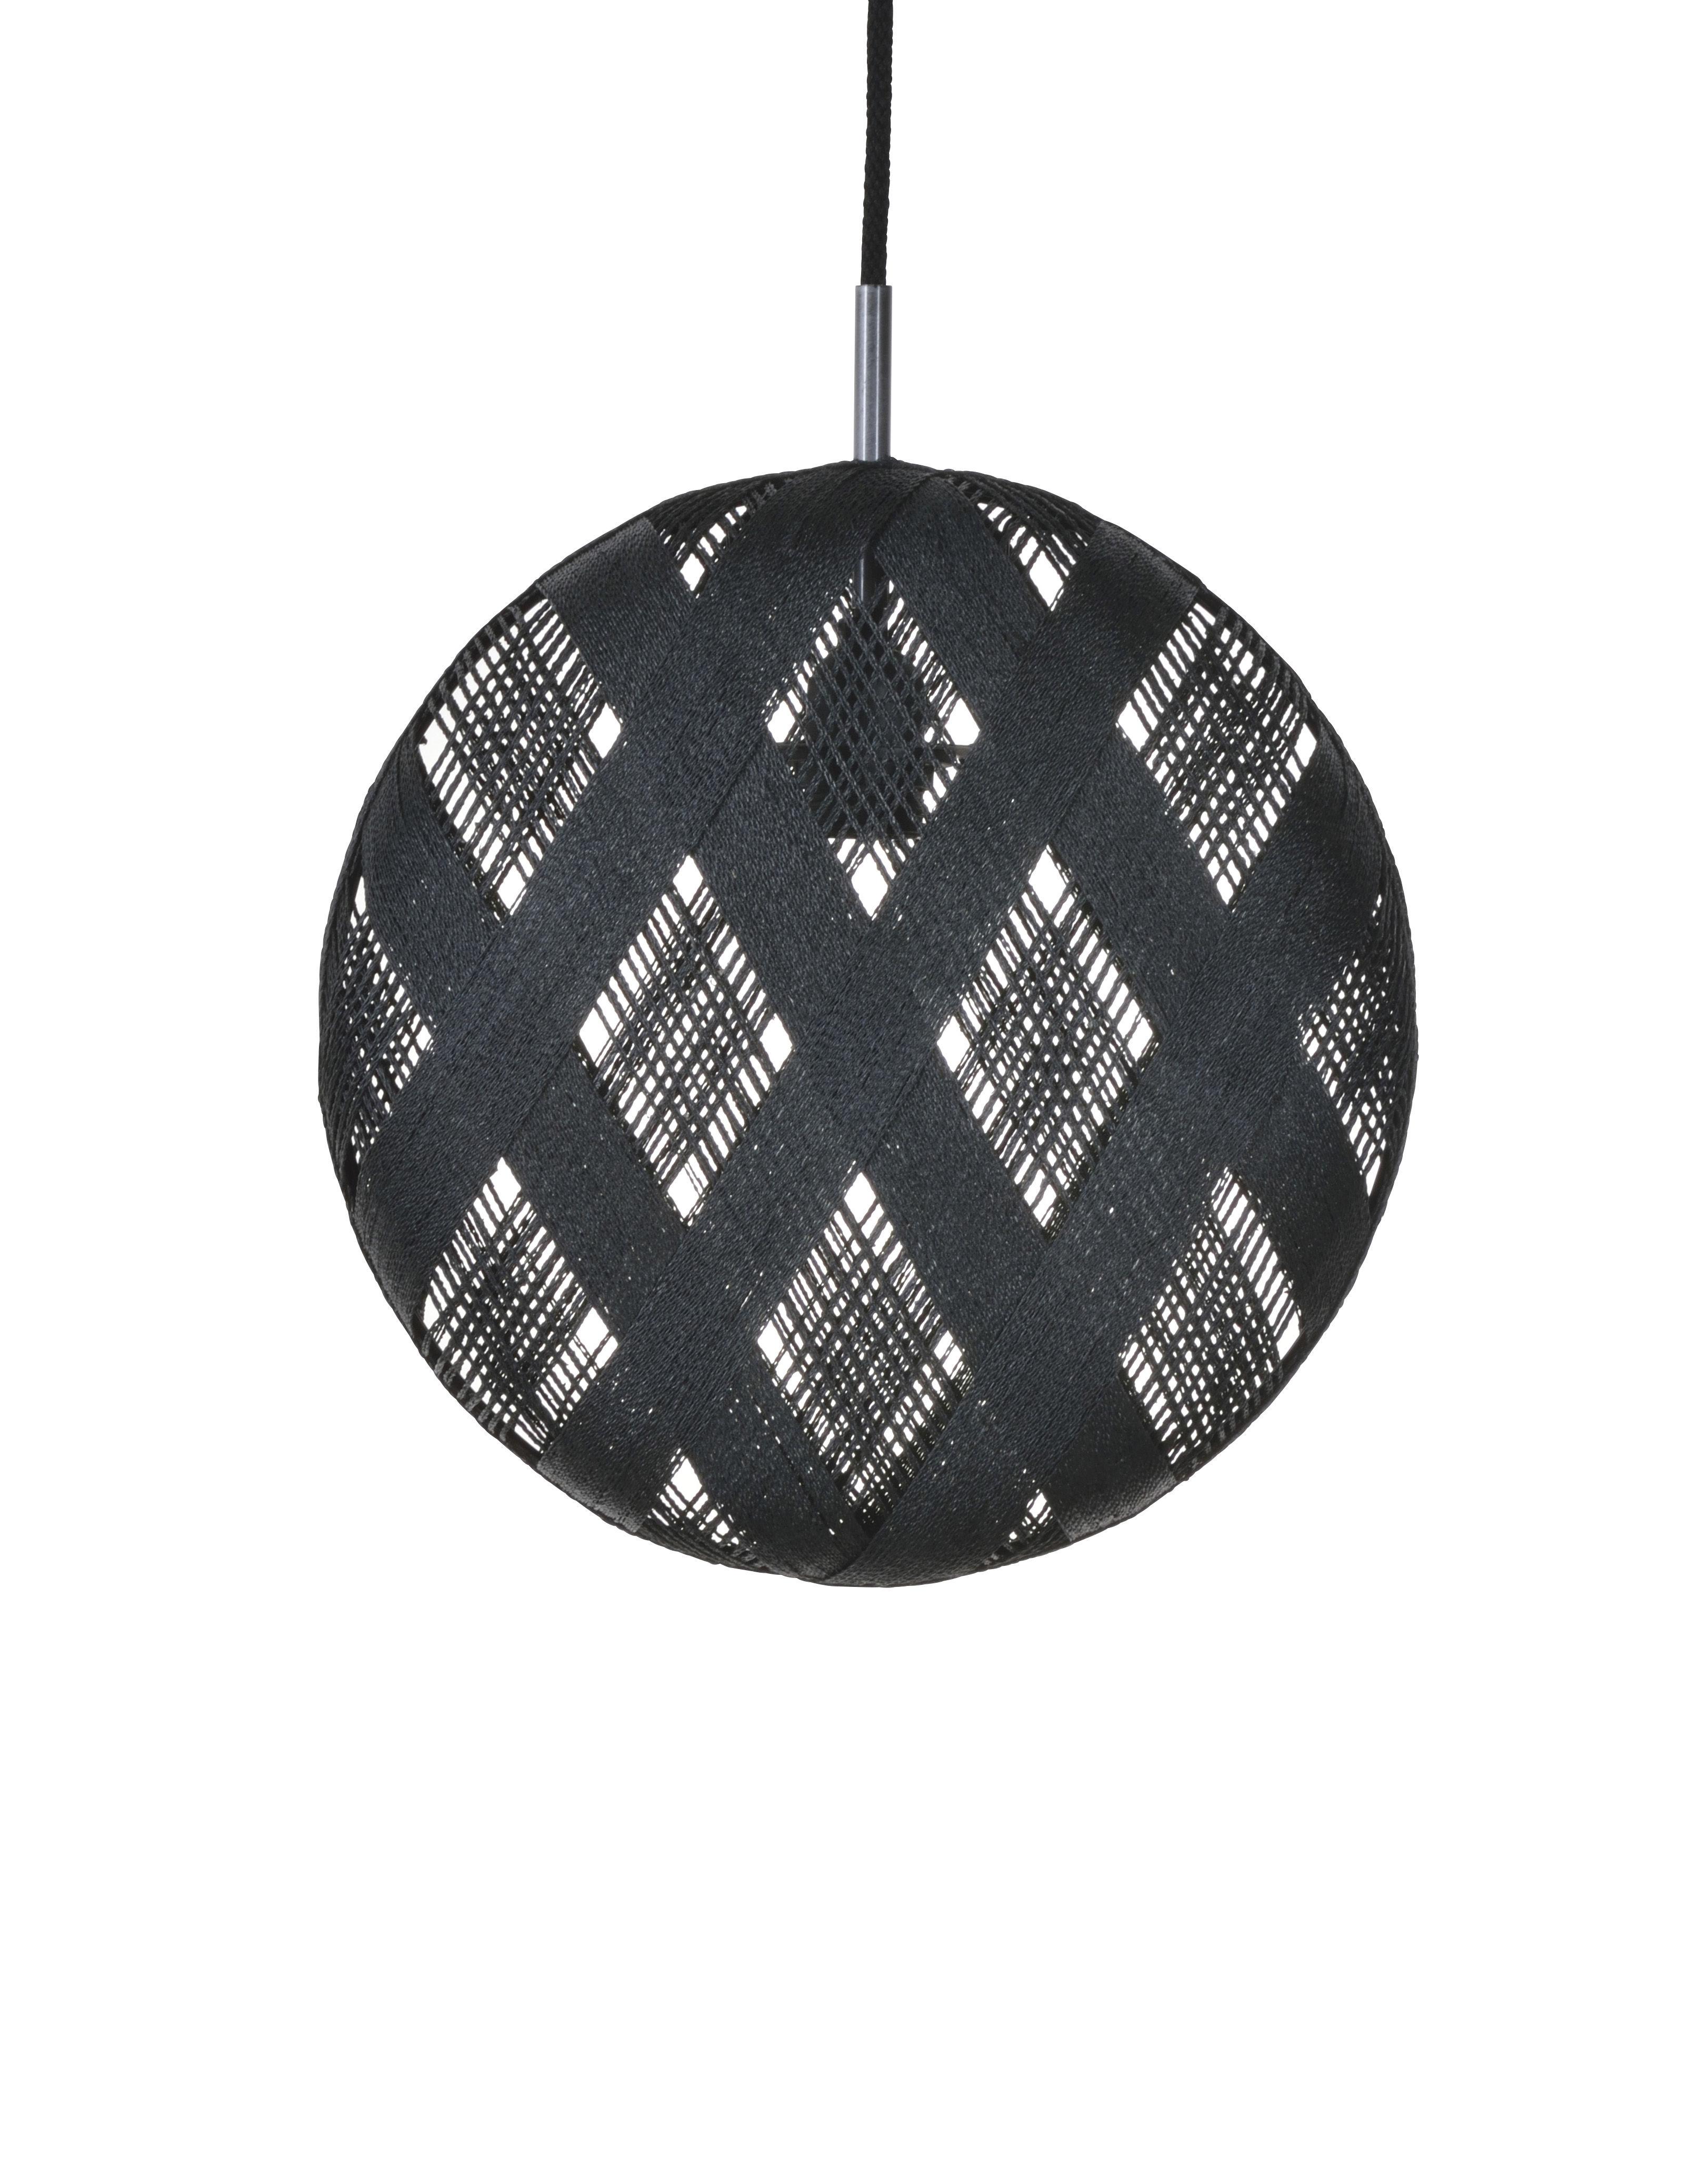 Lighting - Pendant Lighting - Chanpen Diamond Pendant - Ø 36 cm by Forestier - Black / Diamond patterns - Woven acaba